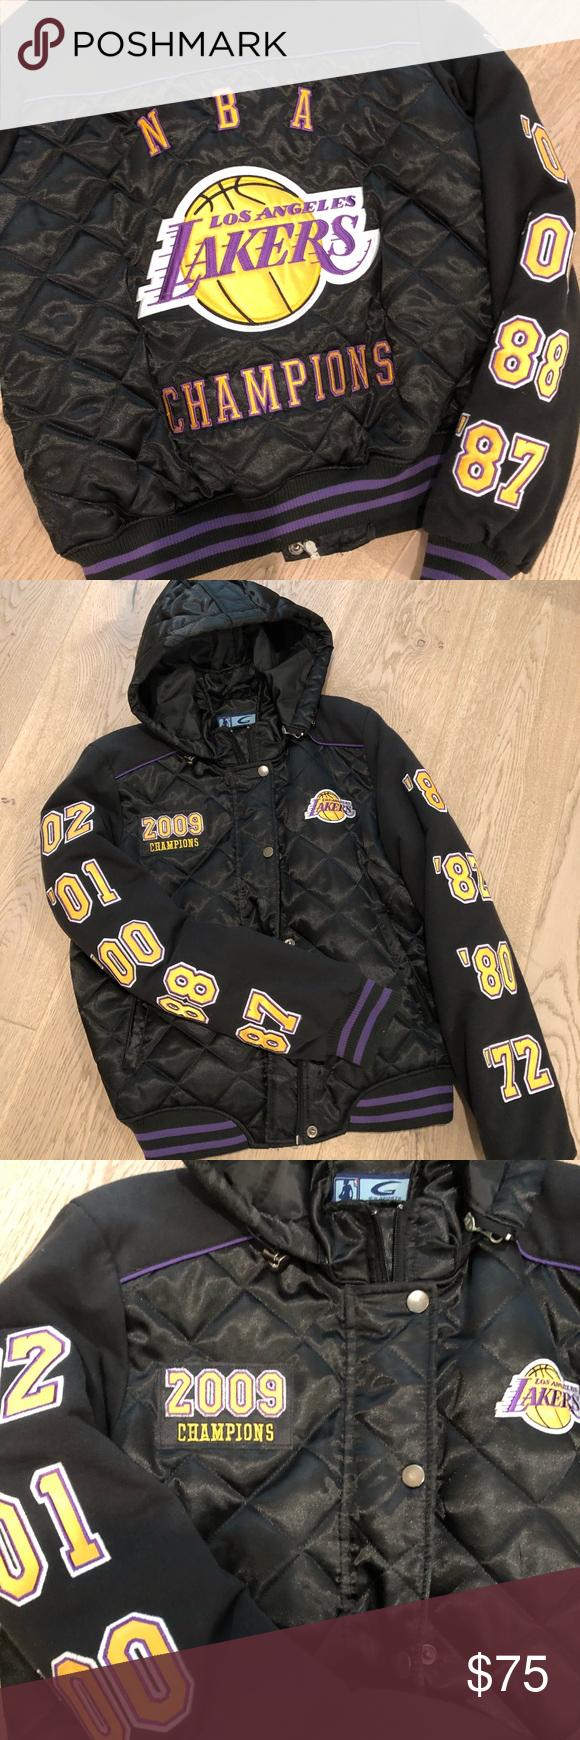 Lakers Championship Jacket Jackets Clothes Design Fashion